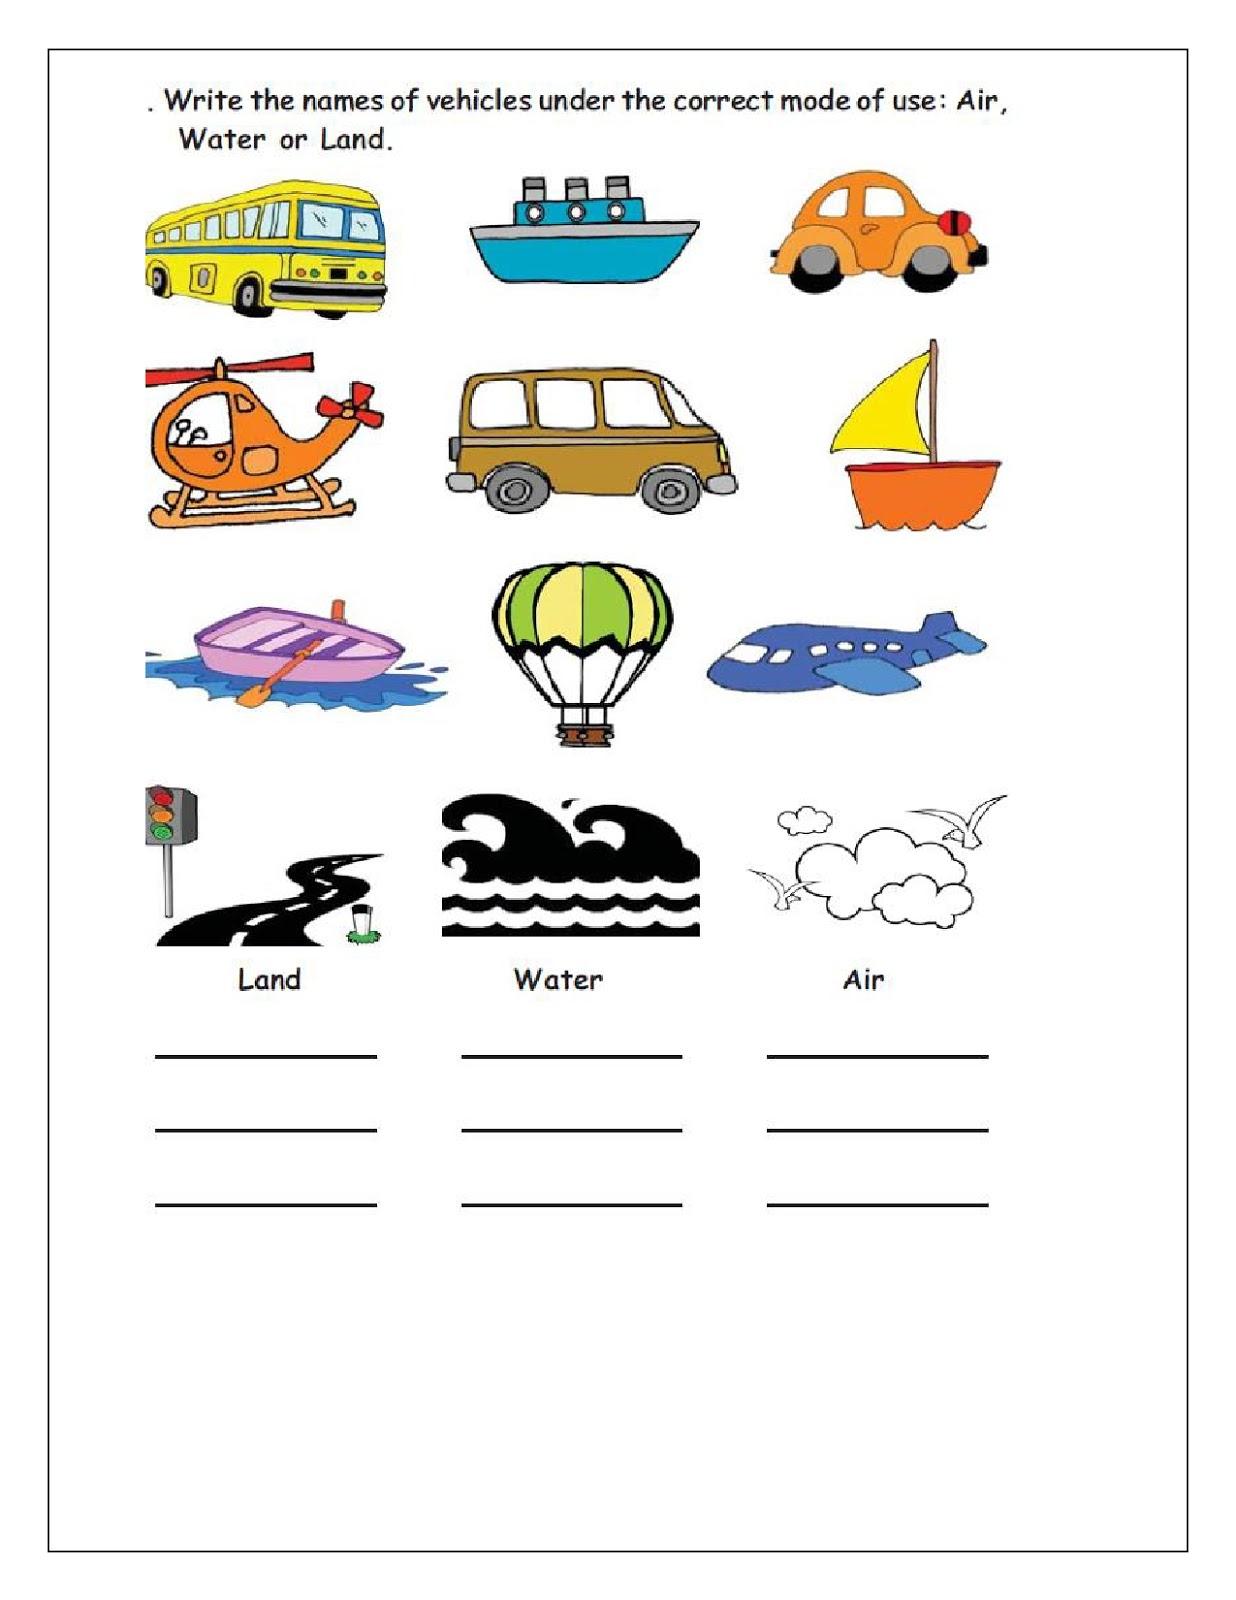 Birla World School Oman Homework For Grade 1b On 25 2 16